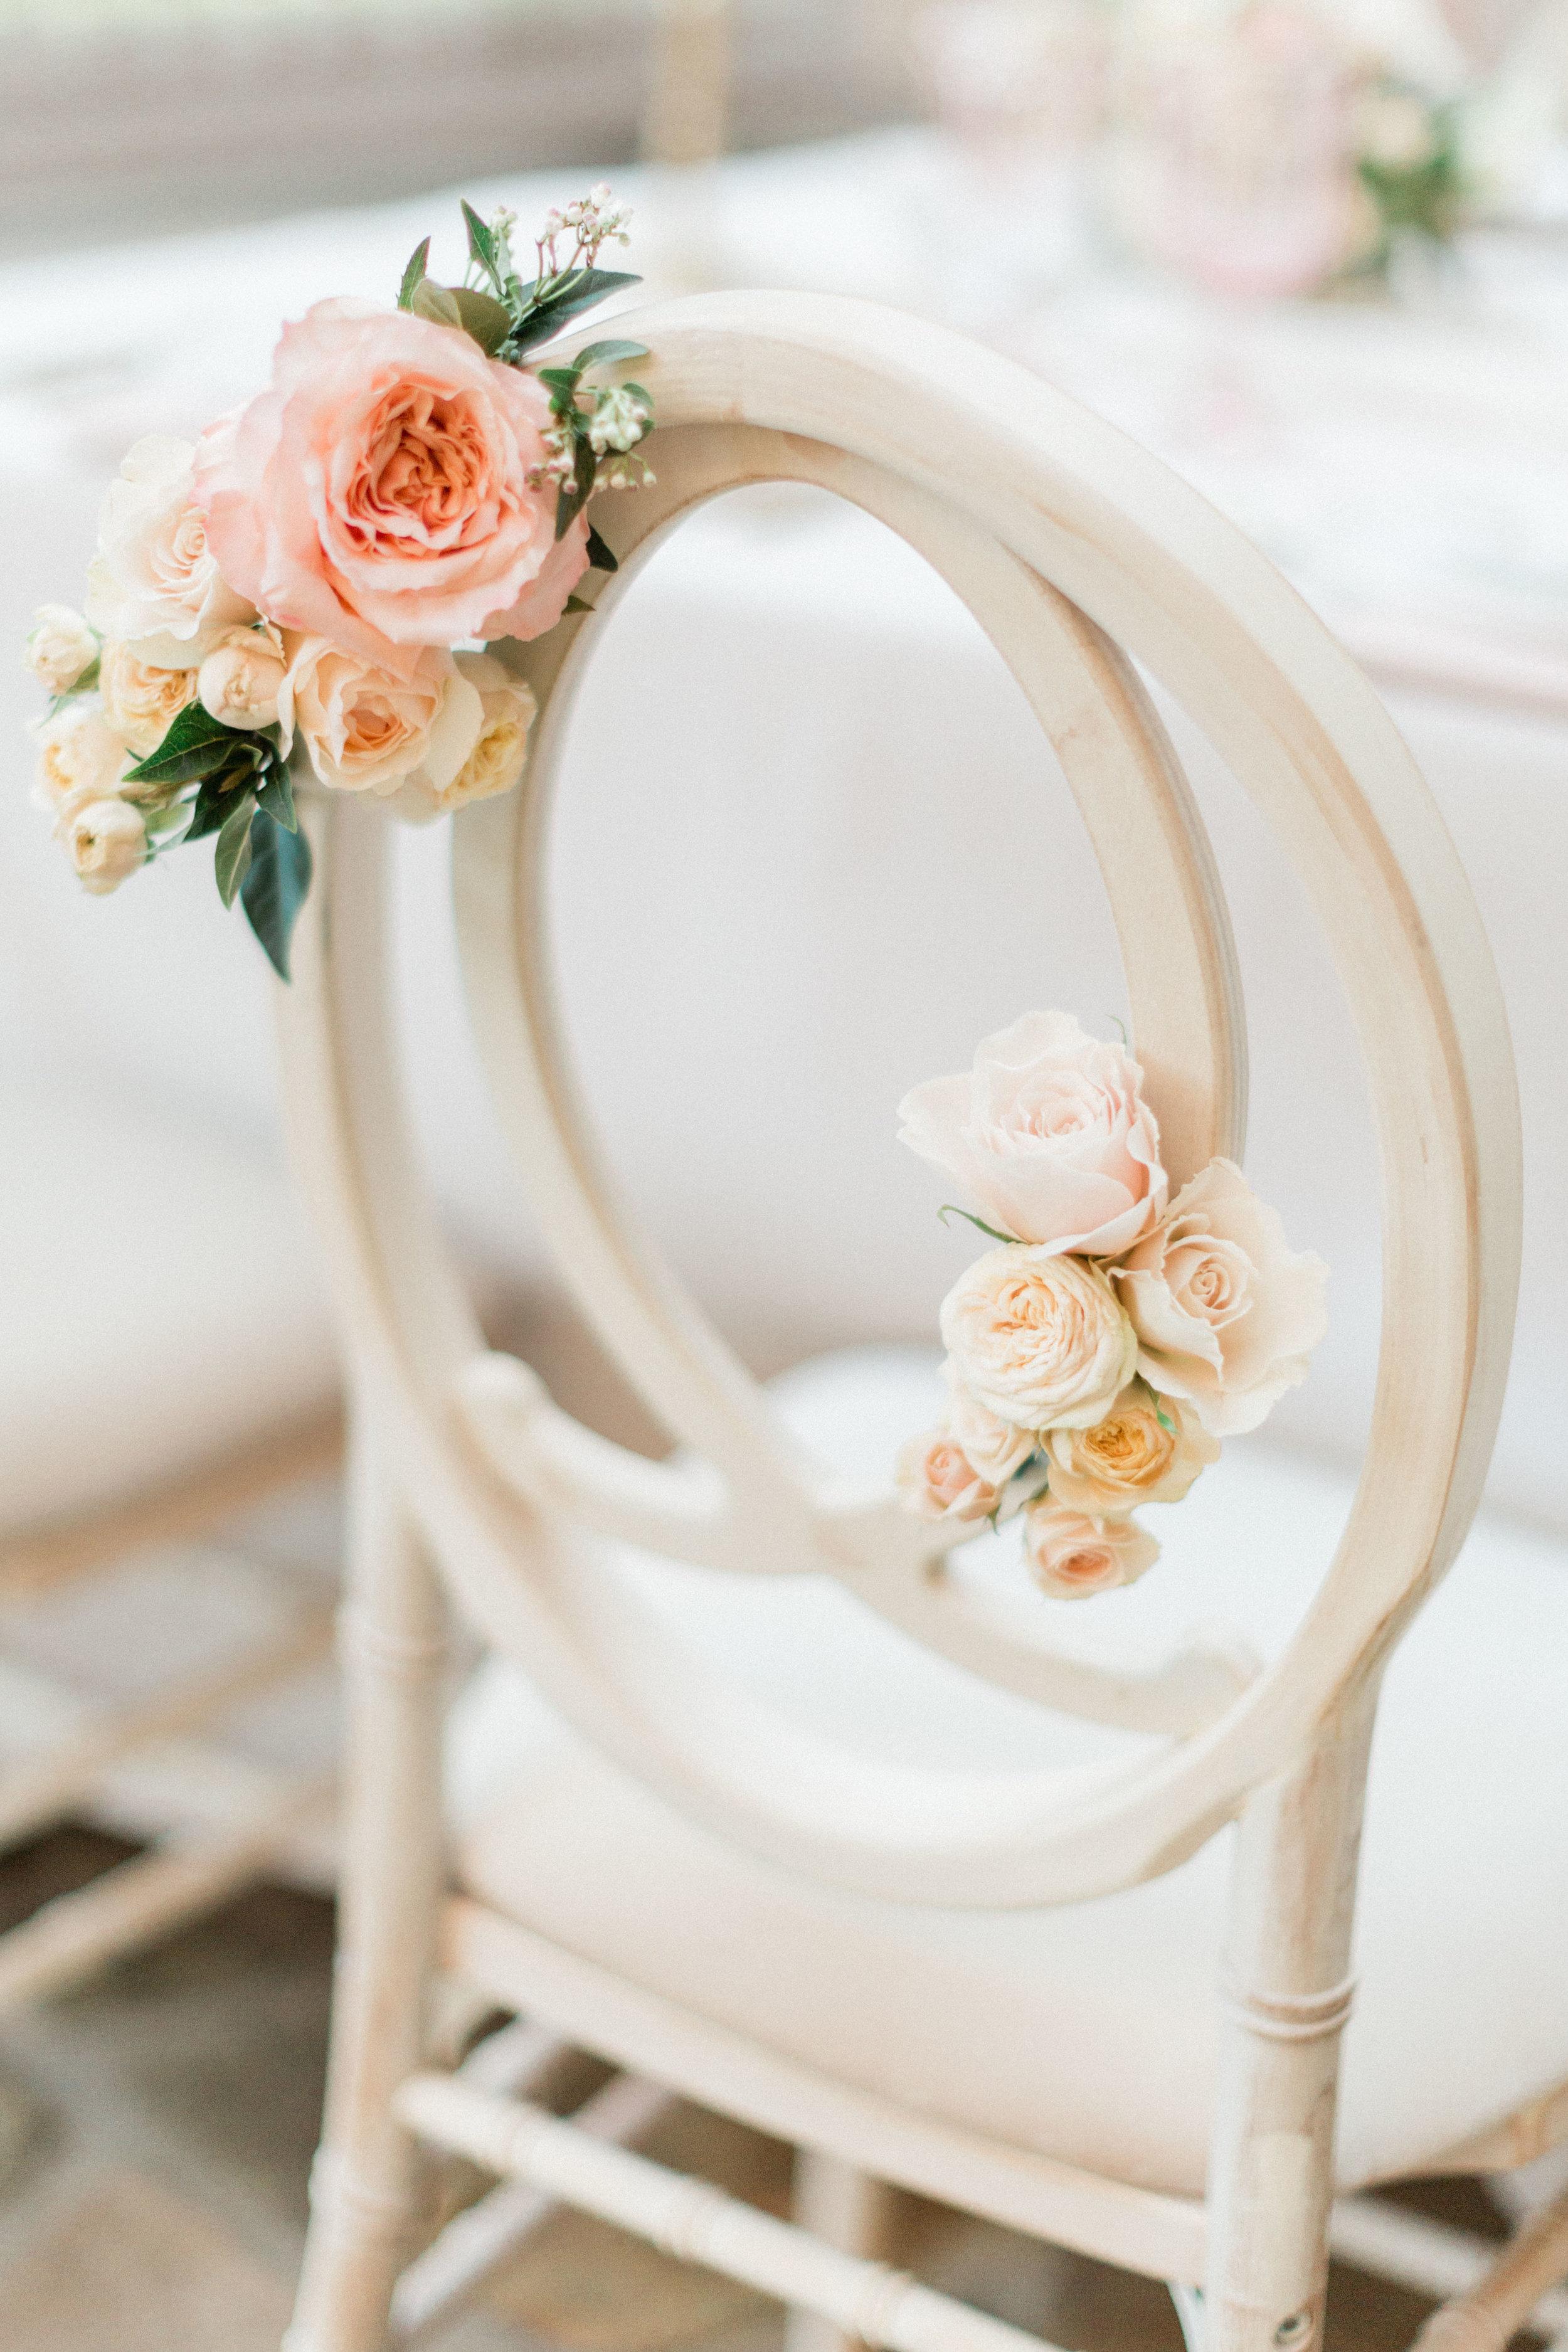 Garden_Style_Lush_Chair_Florals_Sibyl_Sophia_Des_Moines_Iowa.jpg